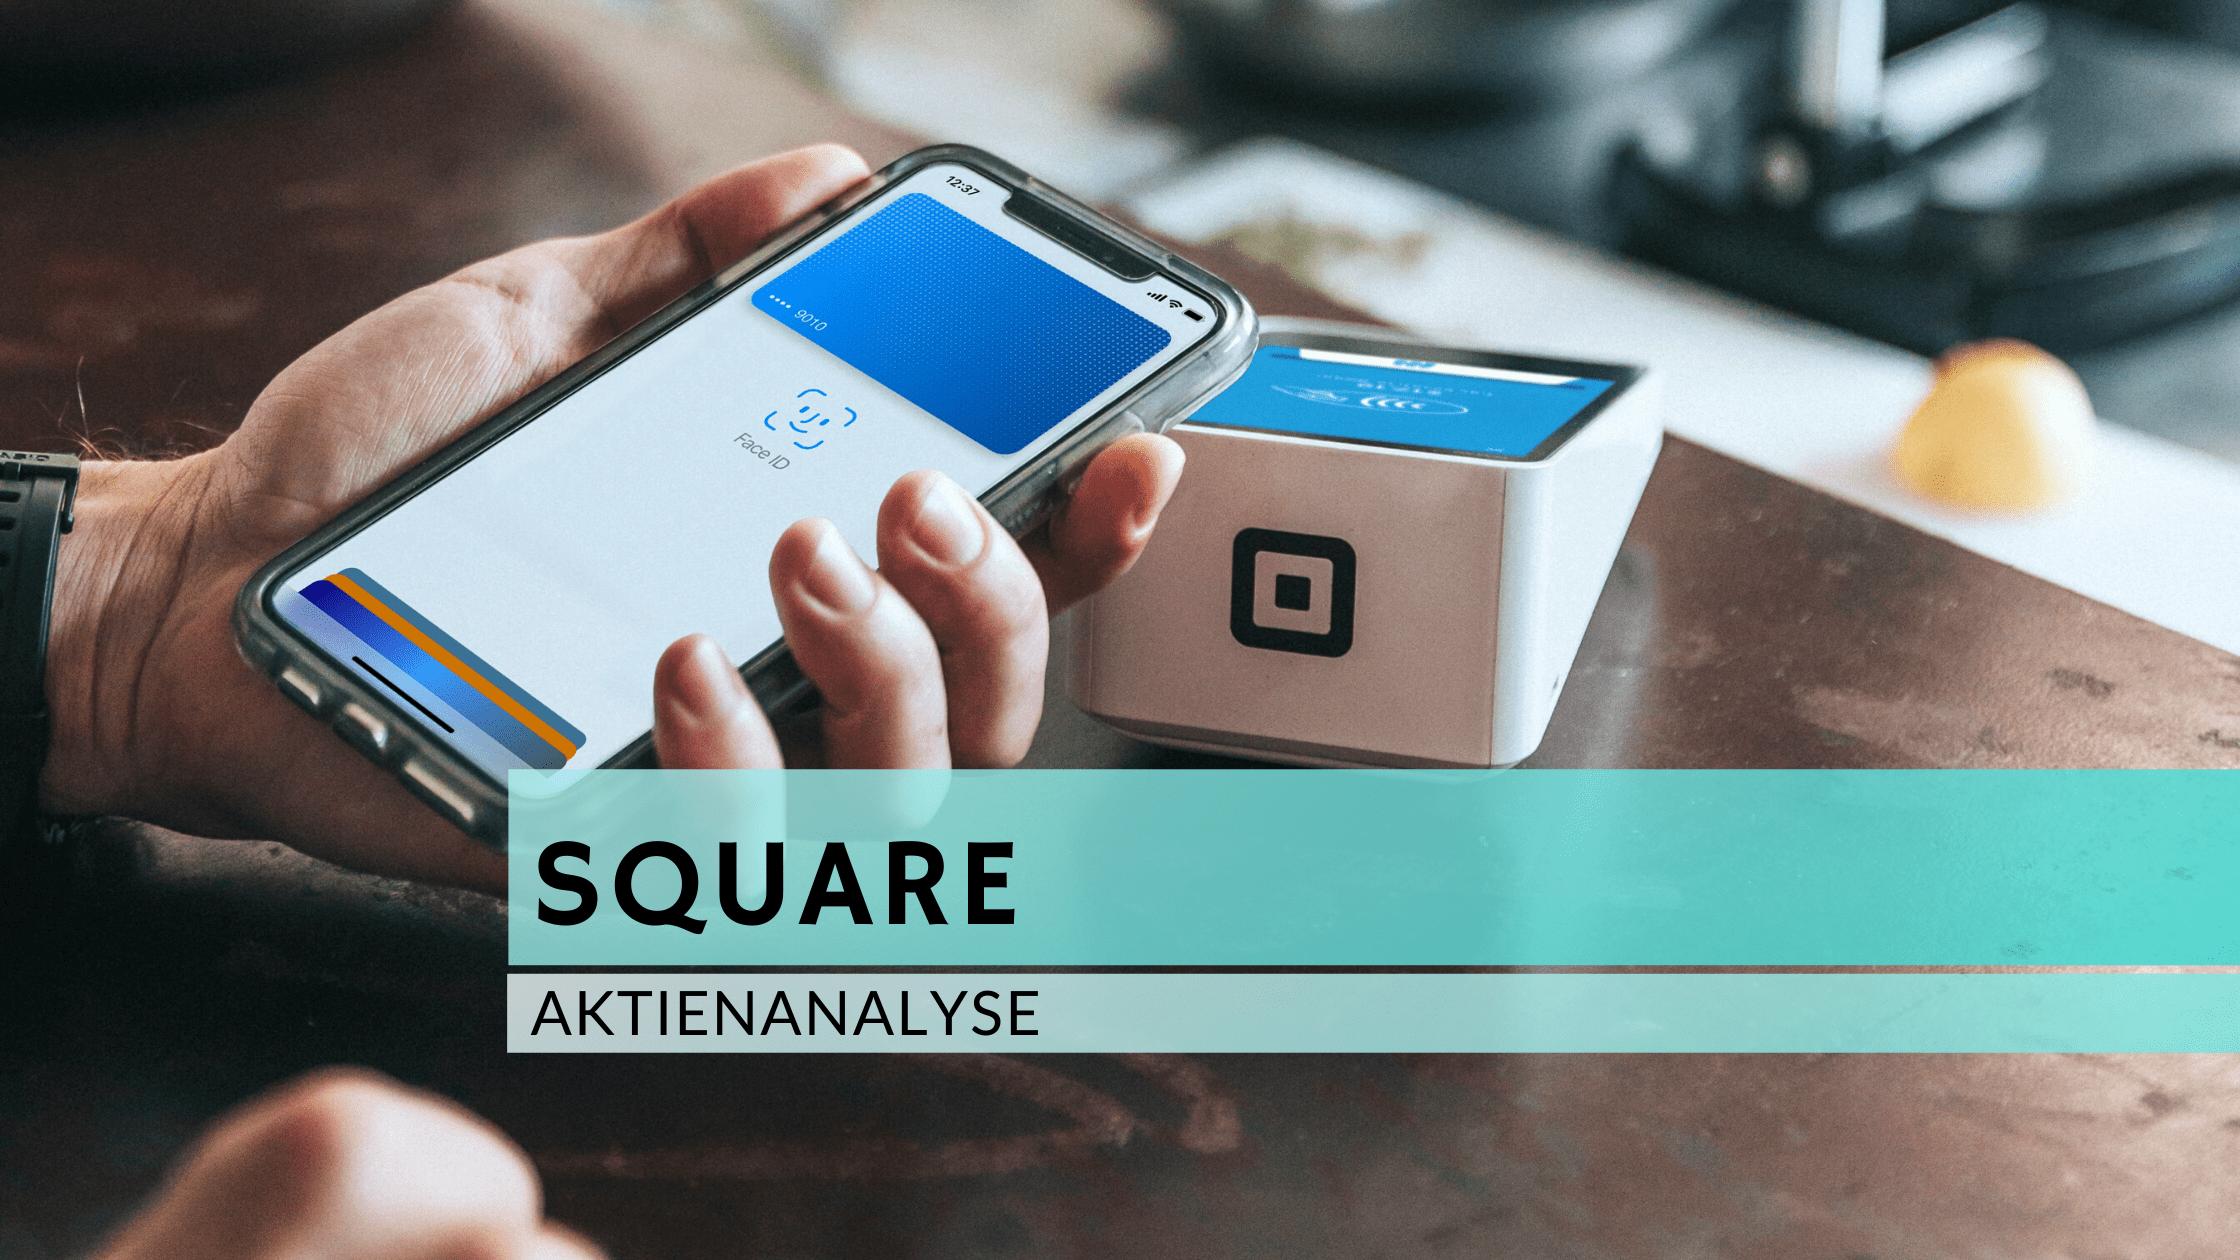 Square Aktienanalyse